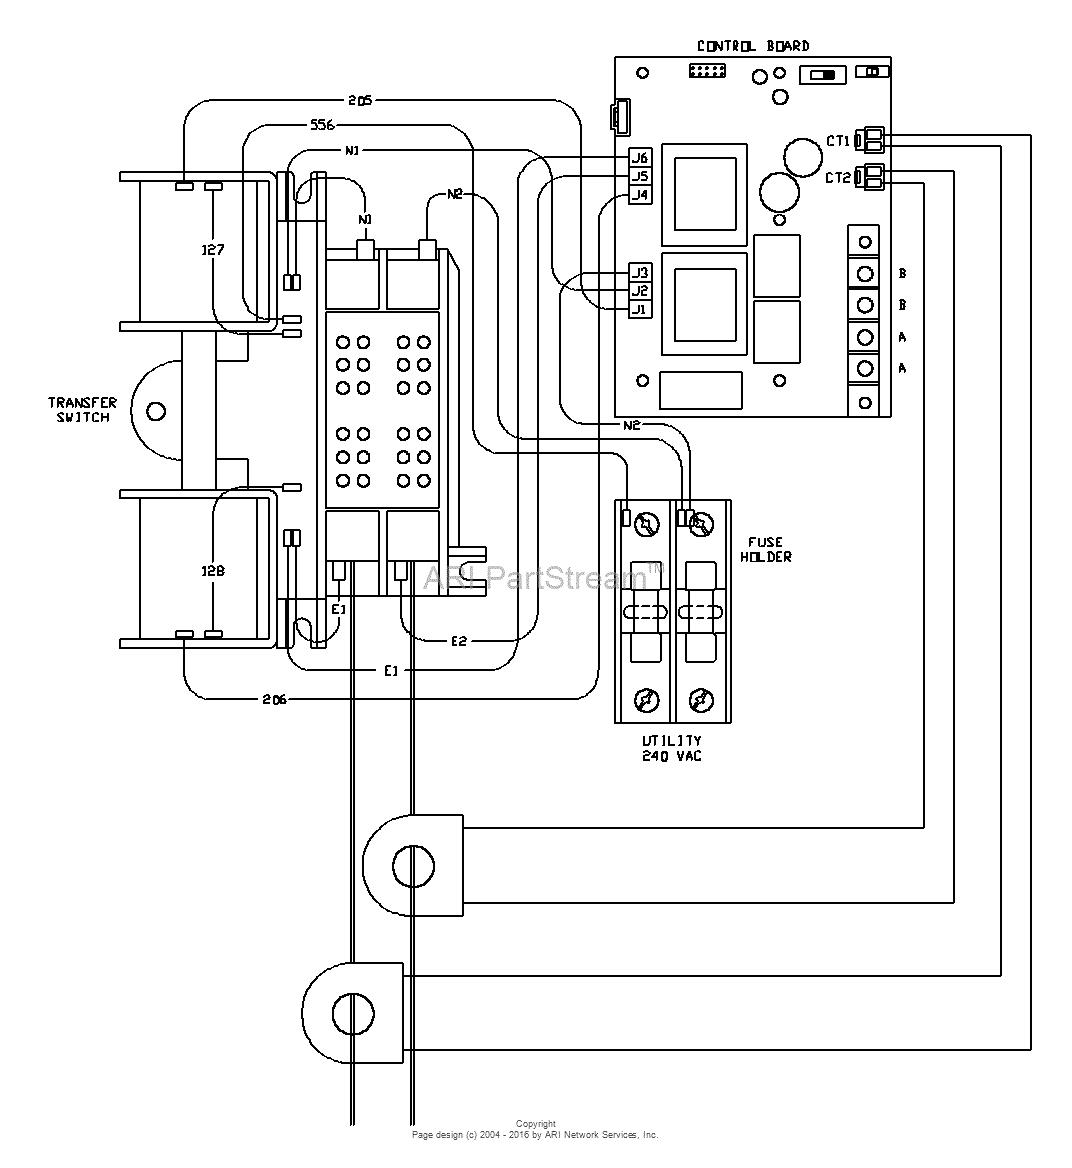 wrg 8765 transfer switch wiring schematic generac wiring diagram model 4969